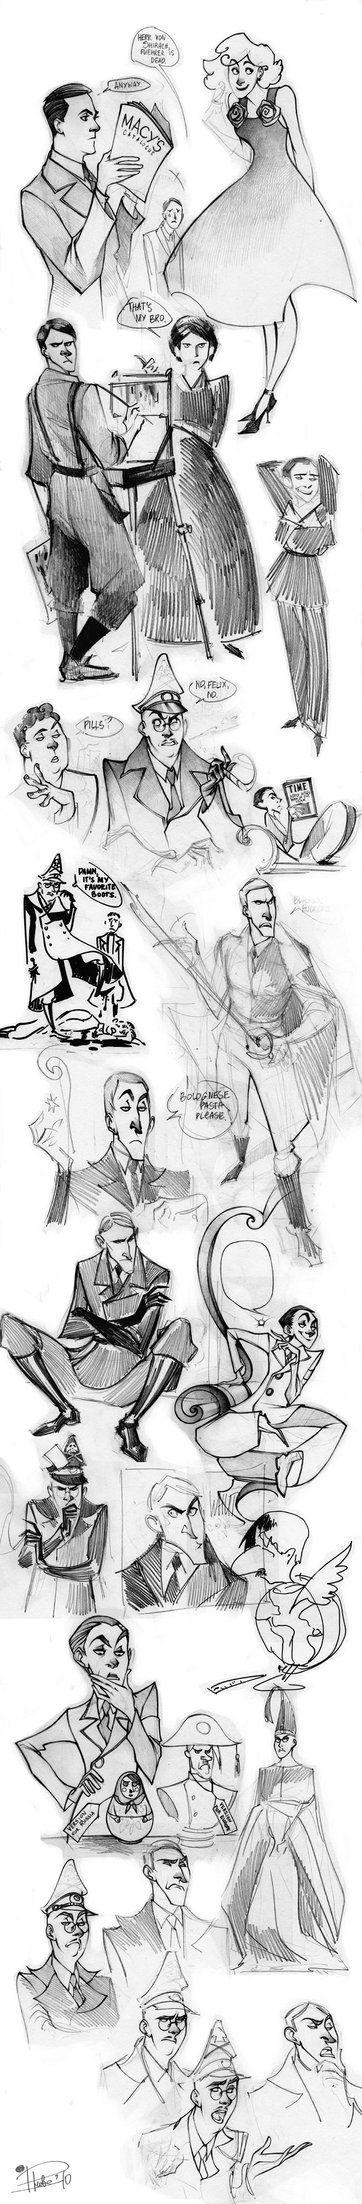 some bad guys sketch dump by Phobs on DeviantArt